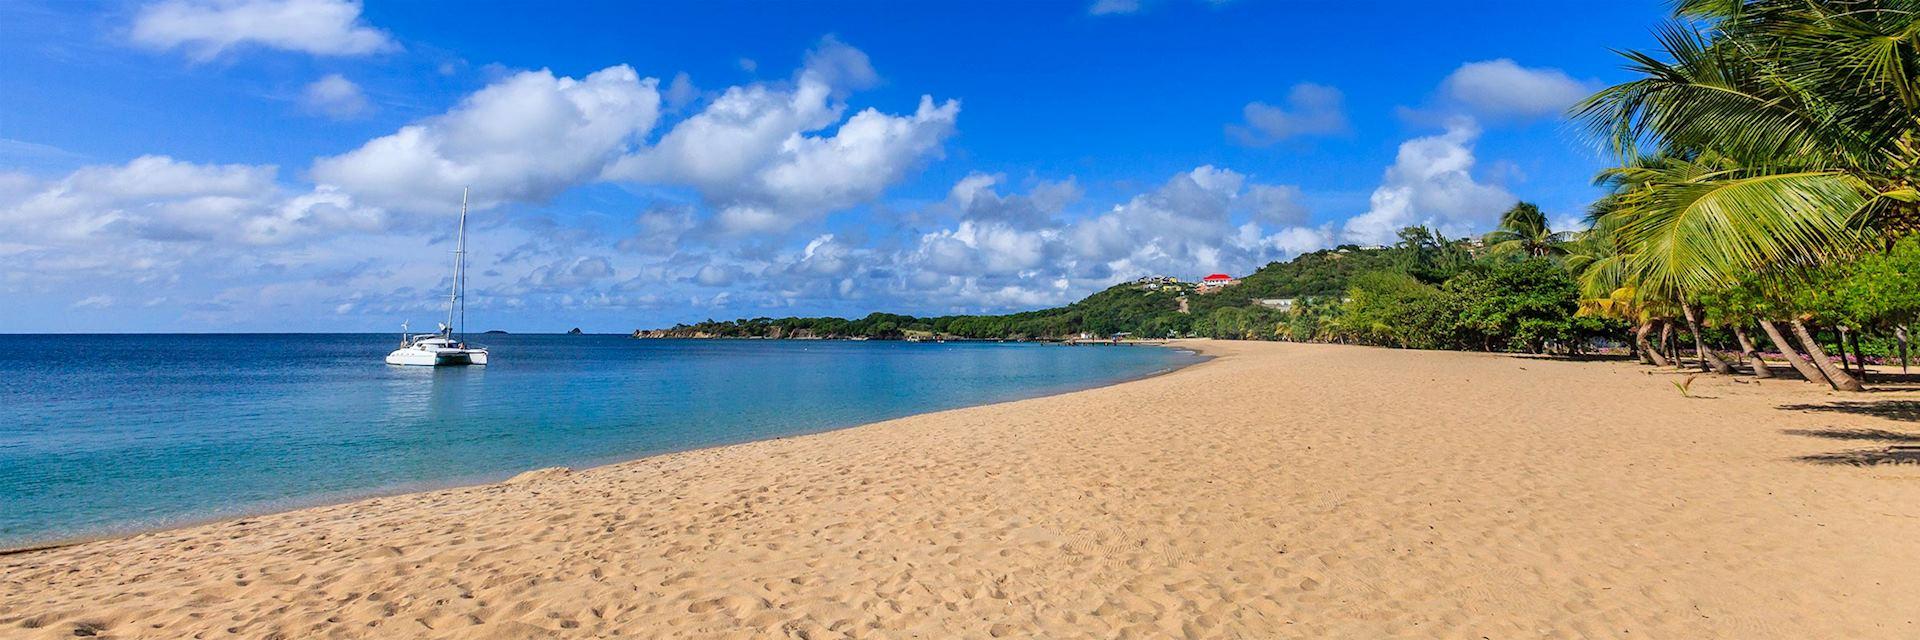 Grenadines Saline Bay, Mayreau Island